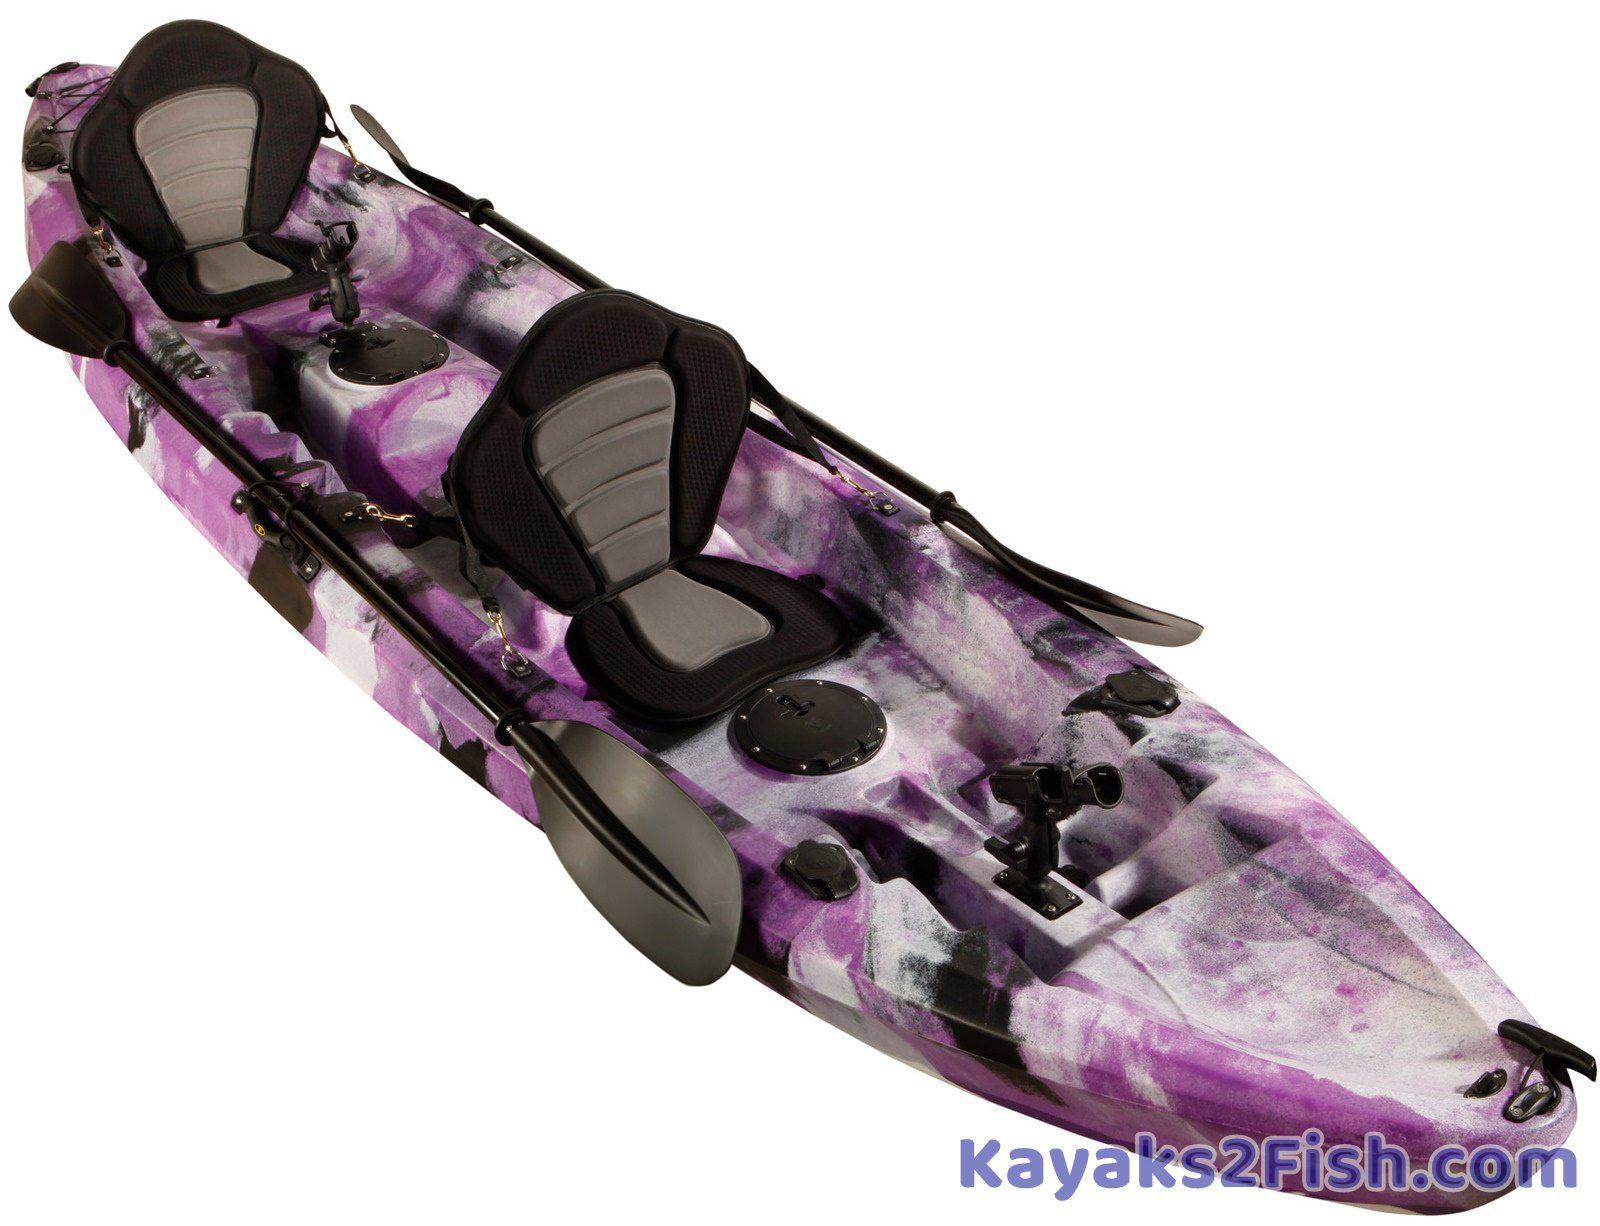 Tandem kayak 2 person kayak double kayak for sale double for 2 seater fishing kayak